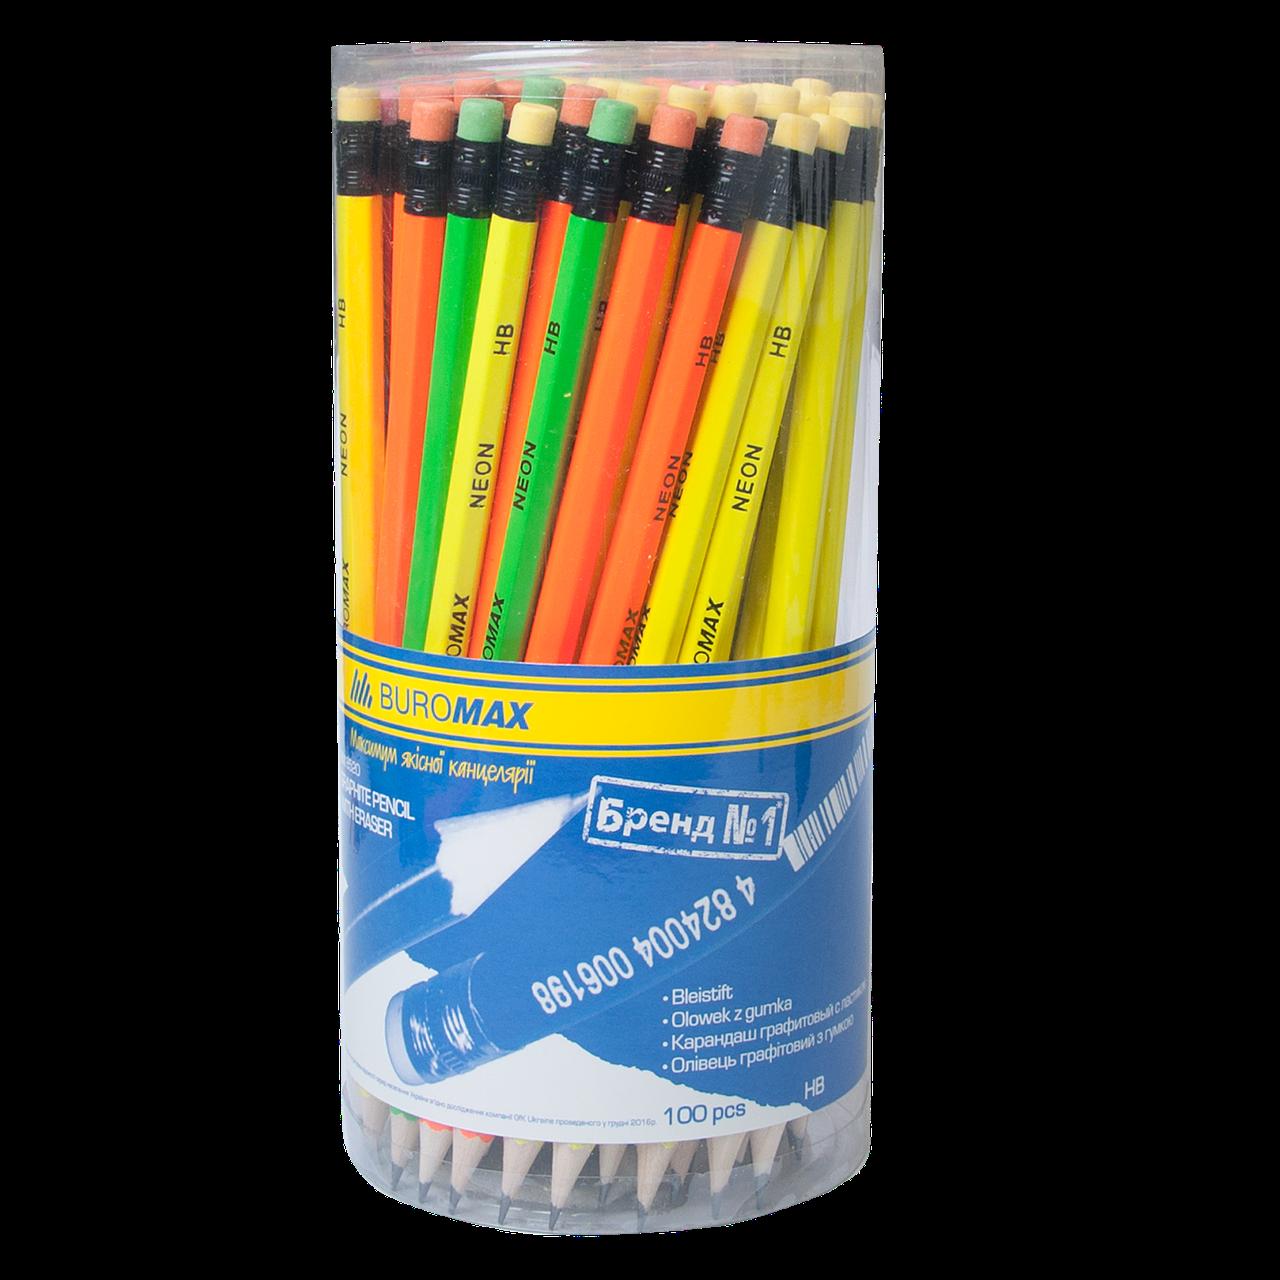 Карандаш графитовый Buromax NEON HB, желтый, с резинкой